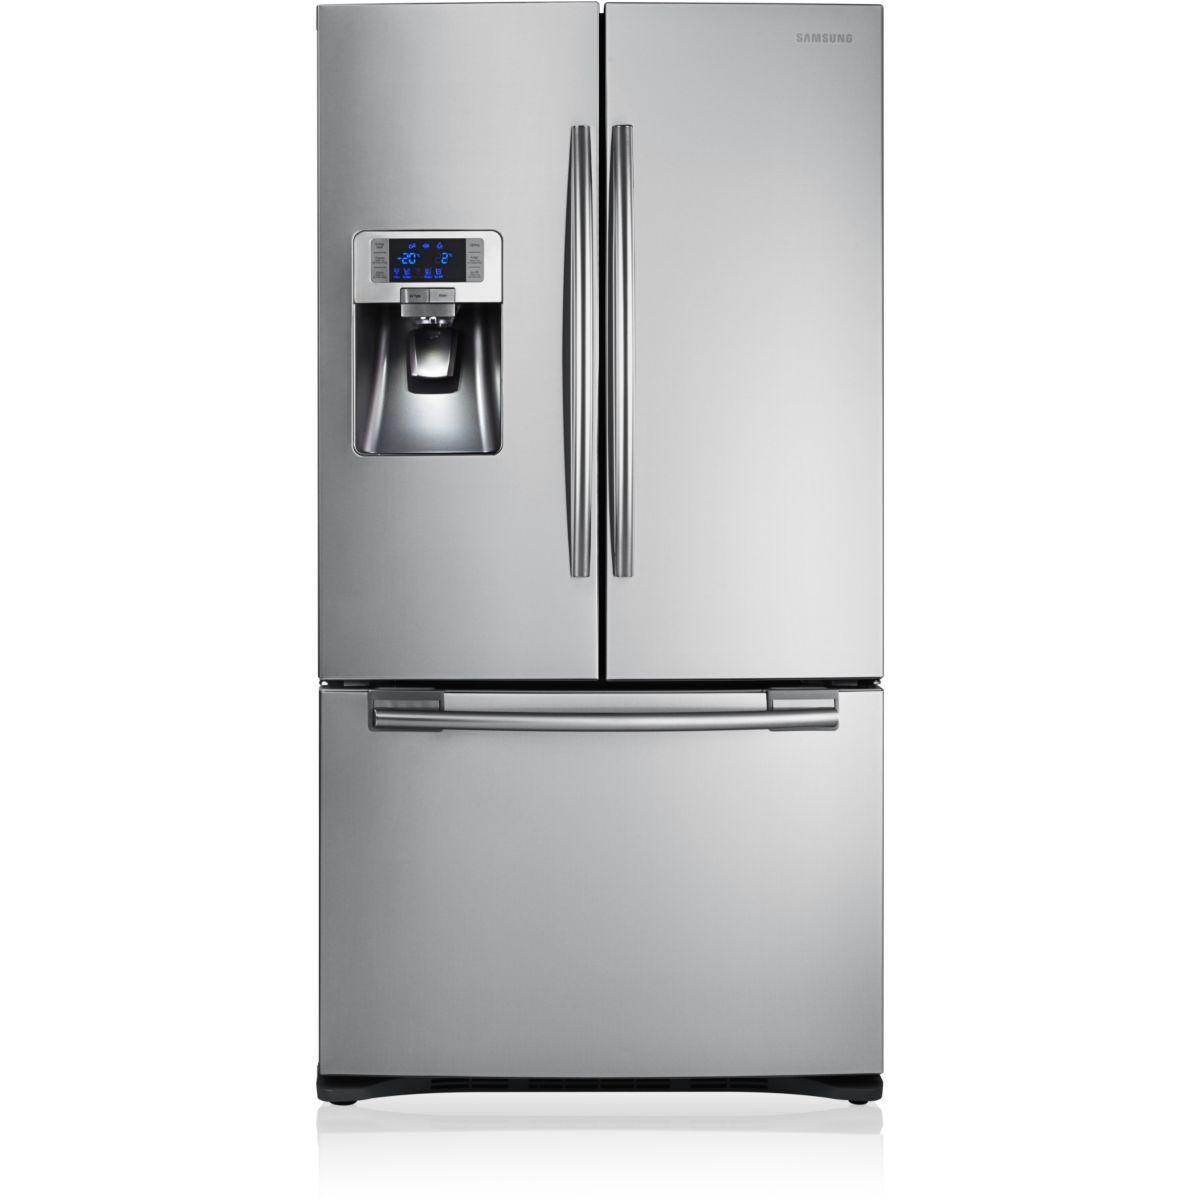 Réfrigérateur multi portes SAMSUNG RFG23RESL1